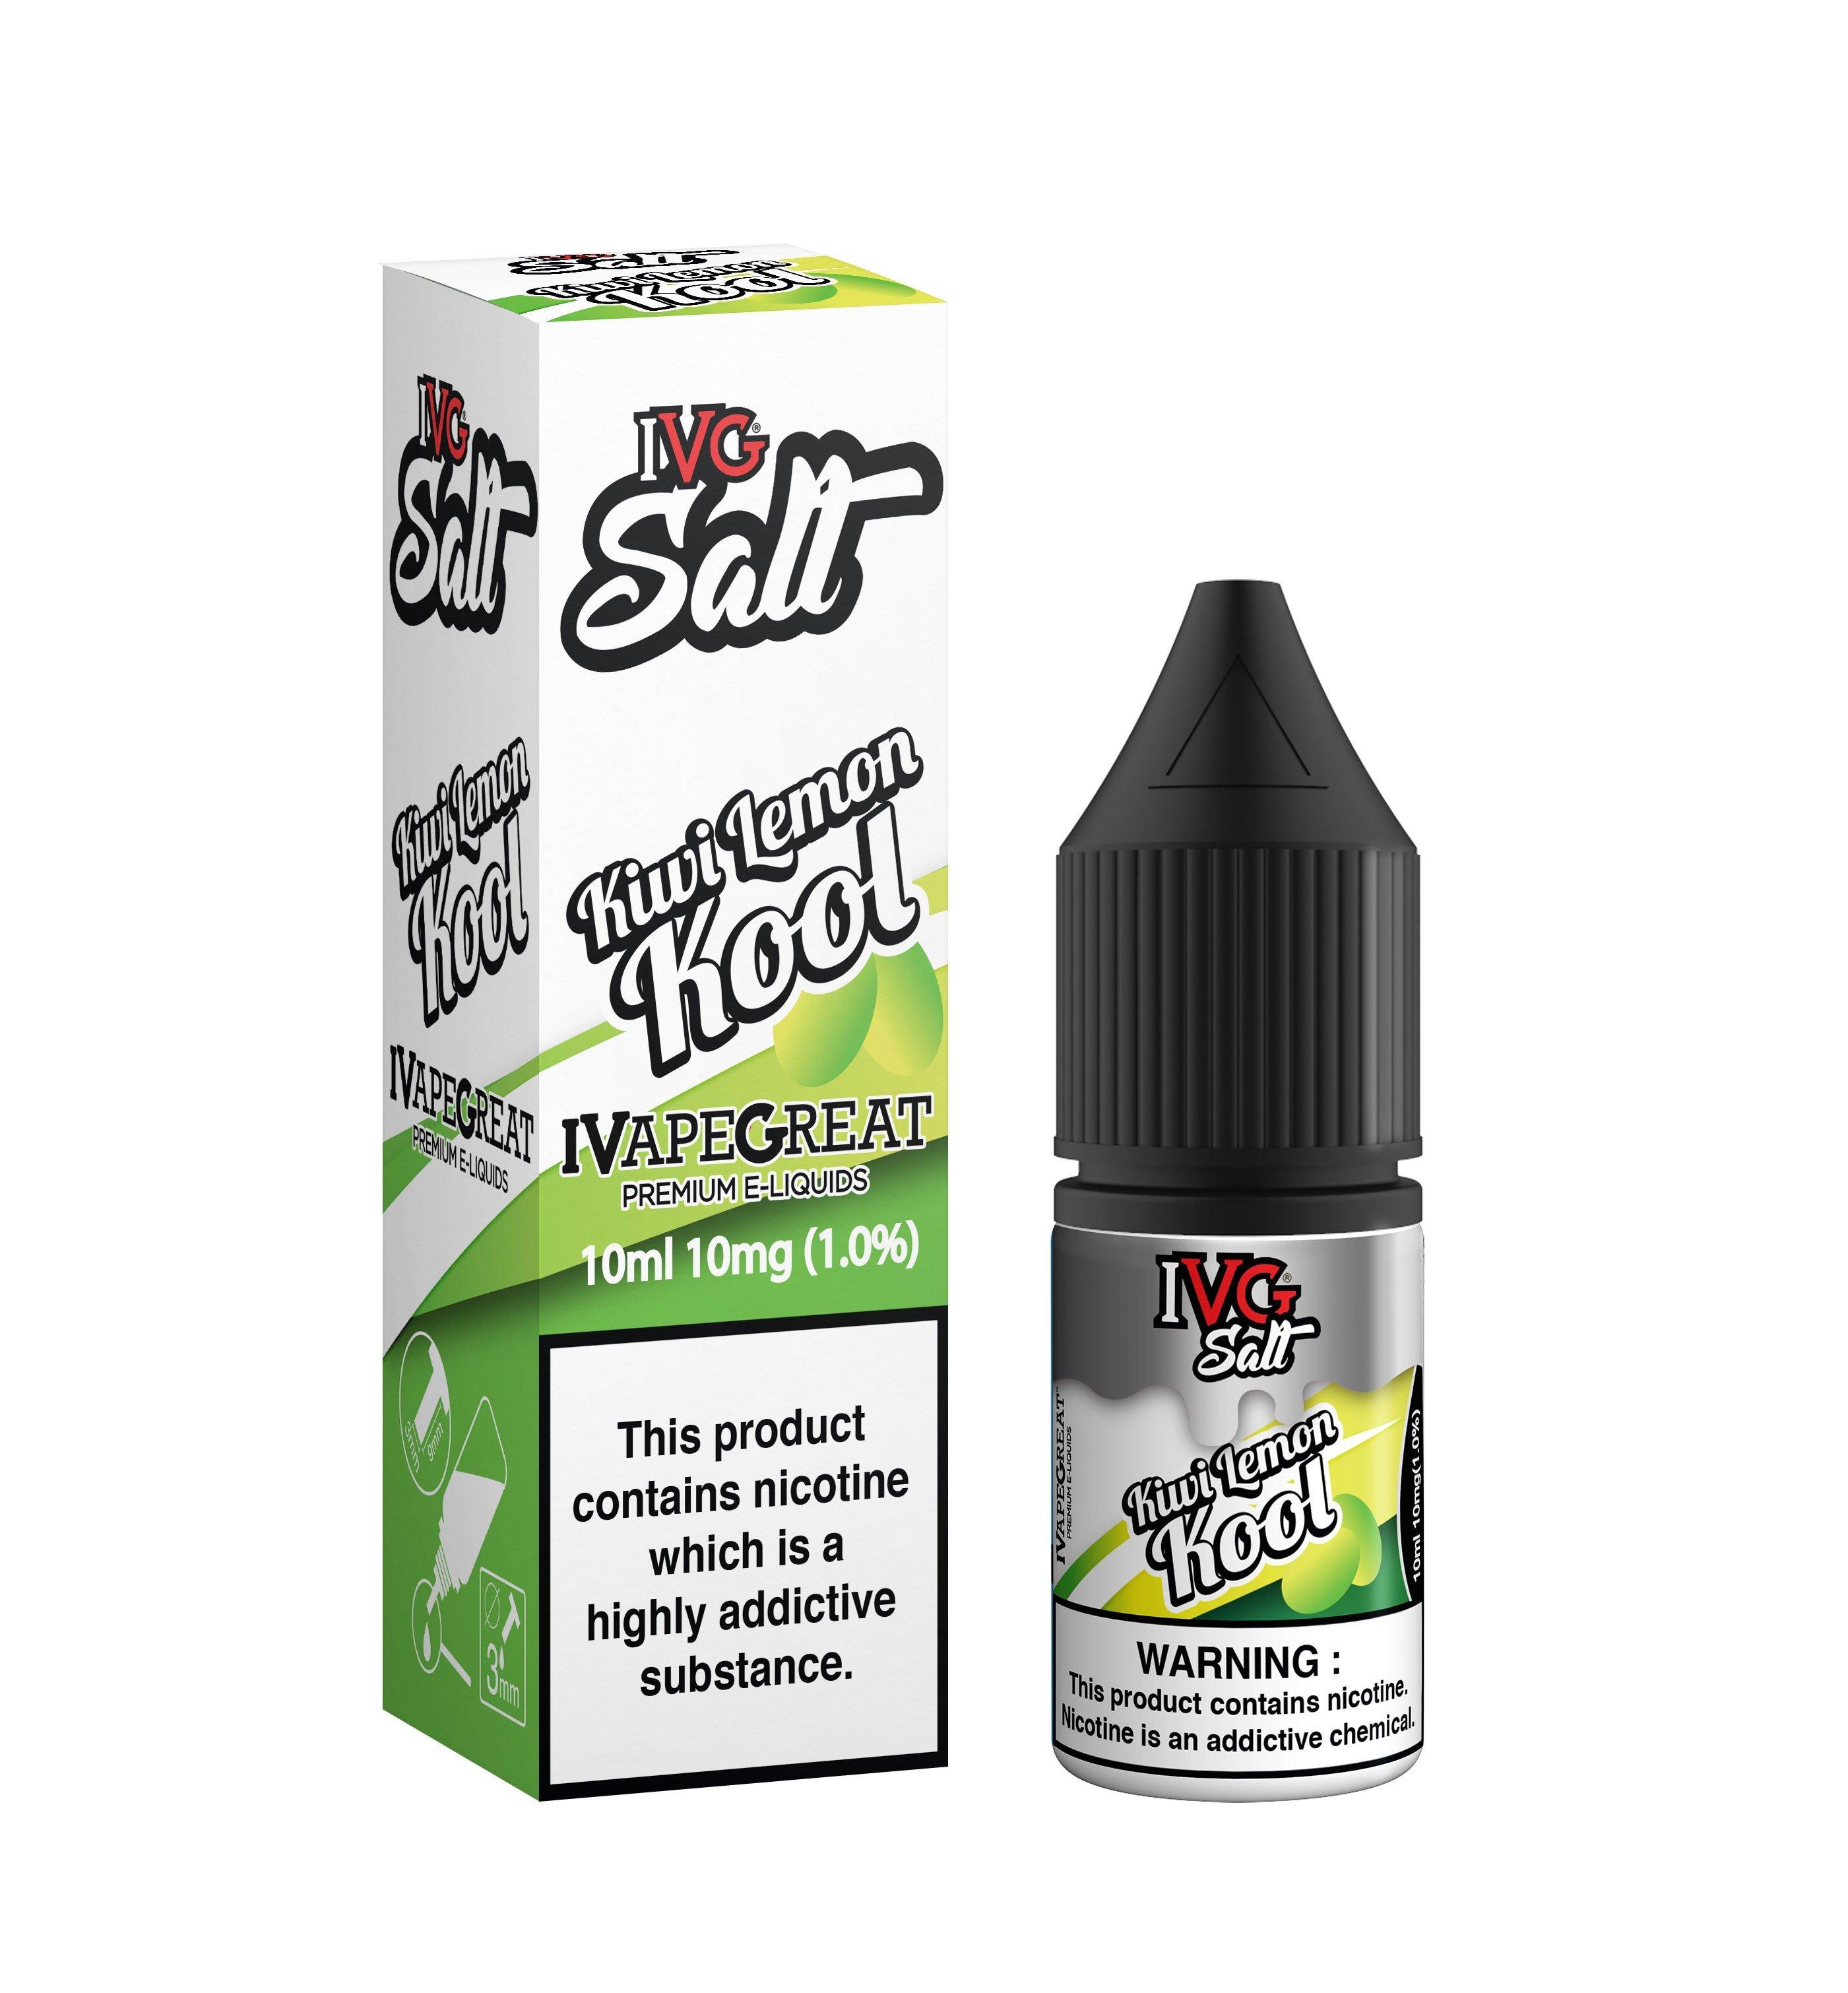 Kiwi Lemon Kool IVG Nic Salt UK